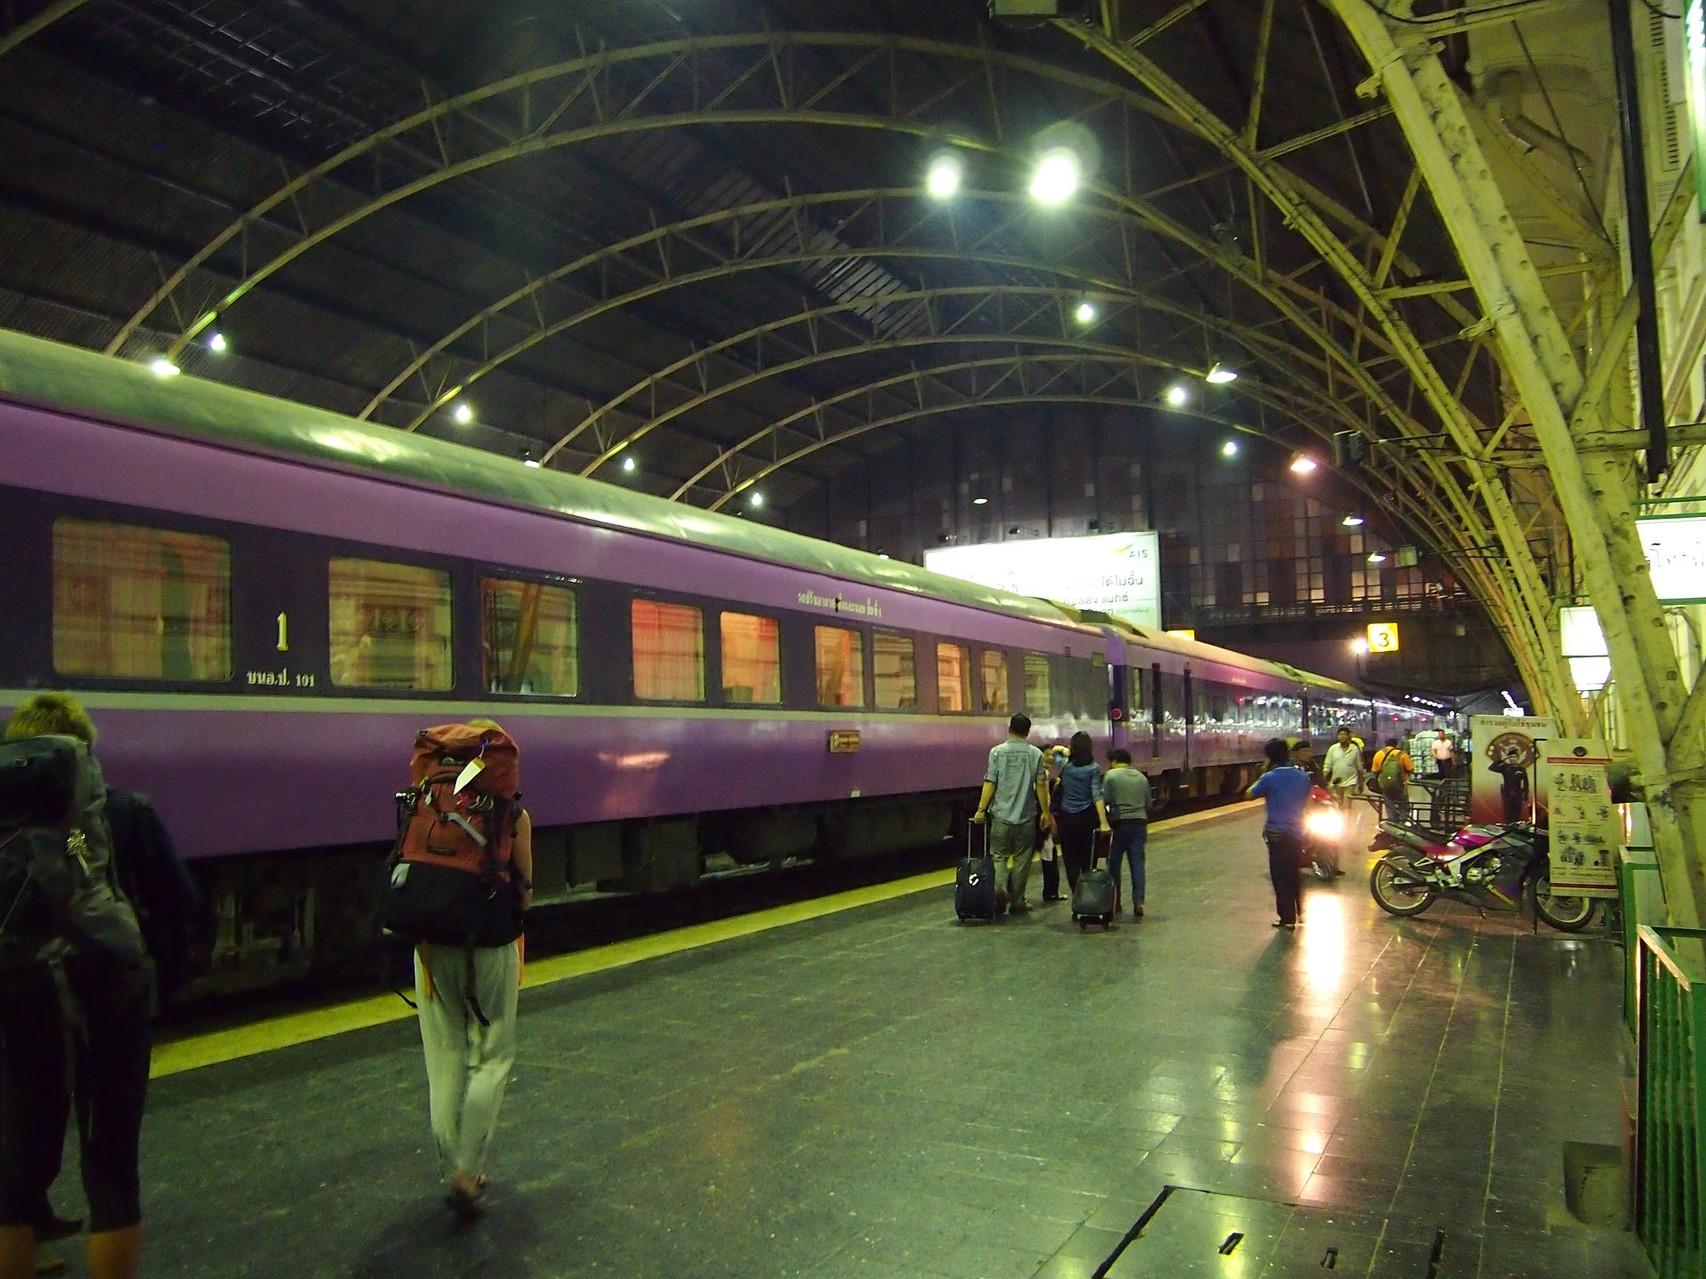 Chiang Mai ist per Bahn in ca. 12 Std. von Bangkok aus erreichbar